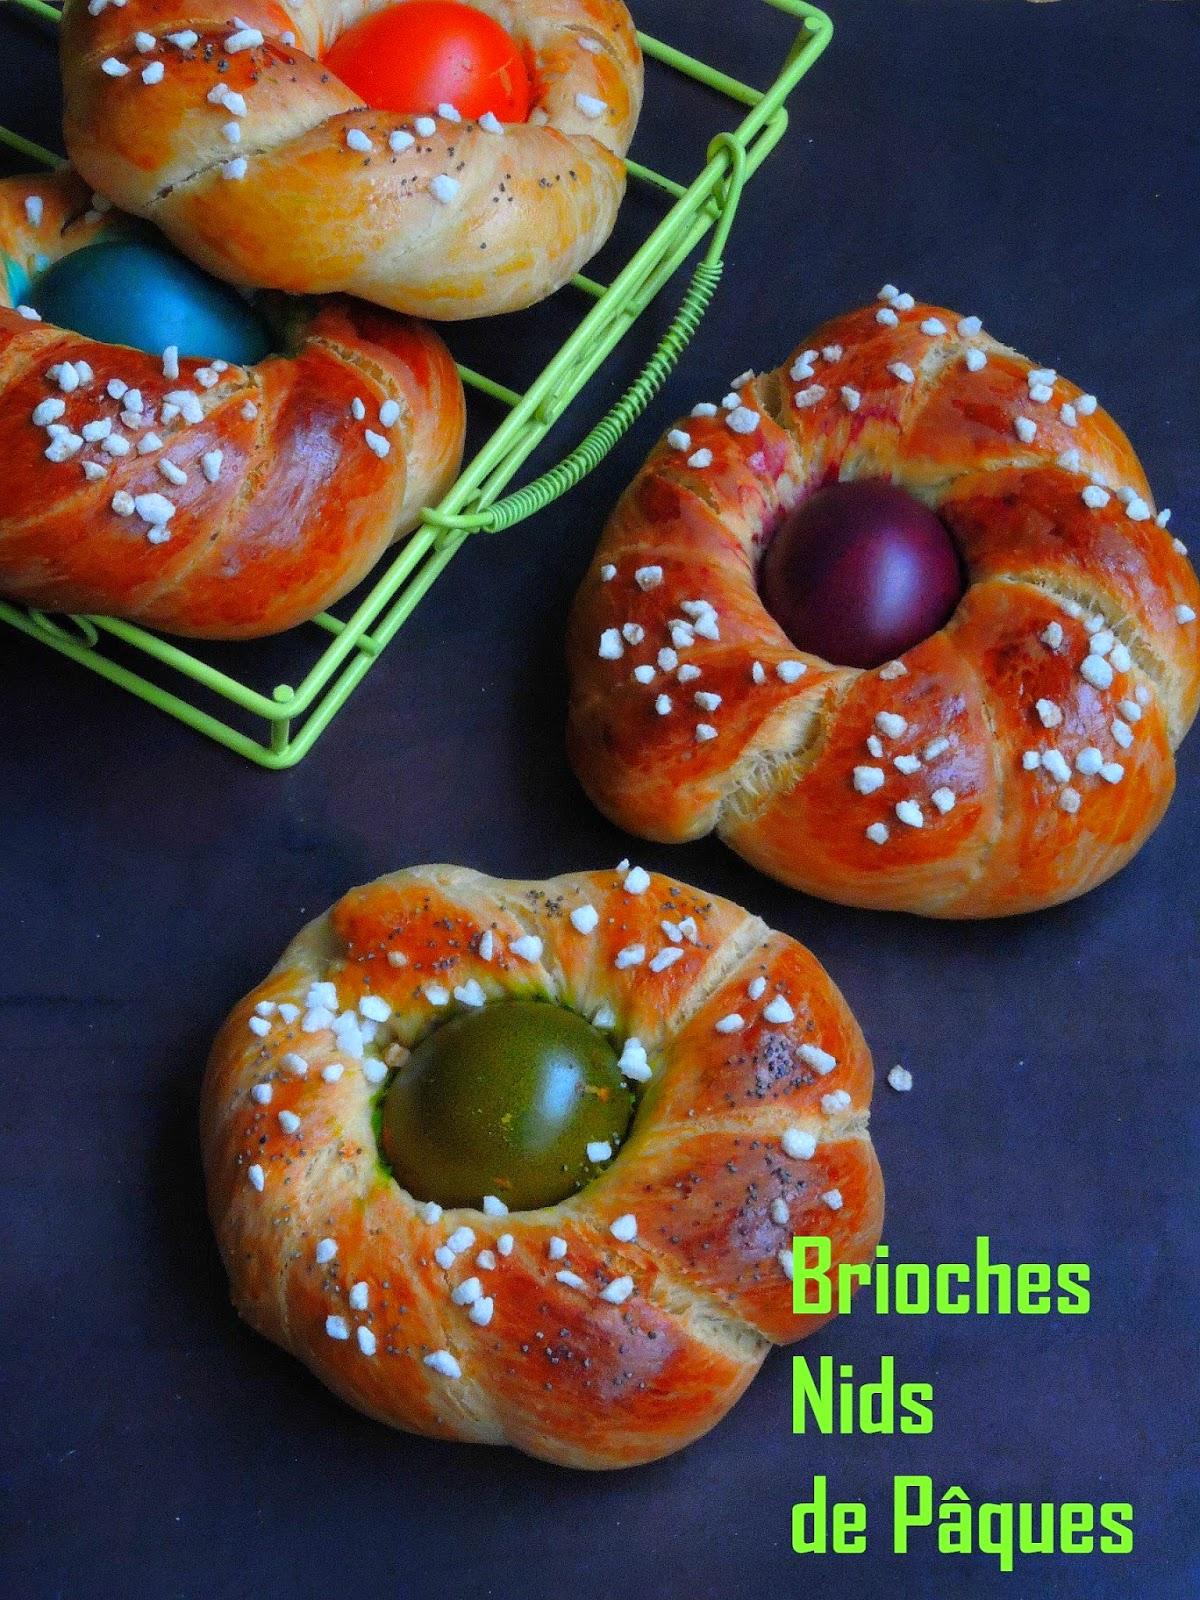 Brioches Nids de Pâques, Easter Brioche Nest